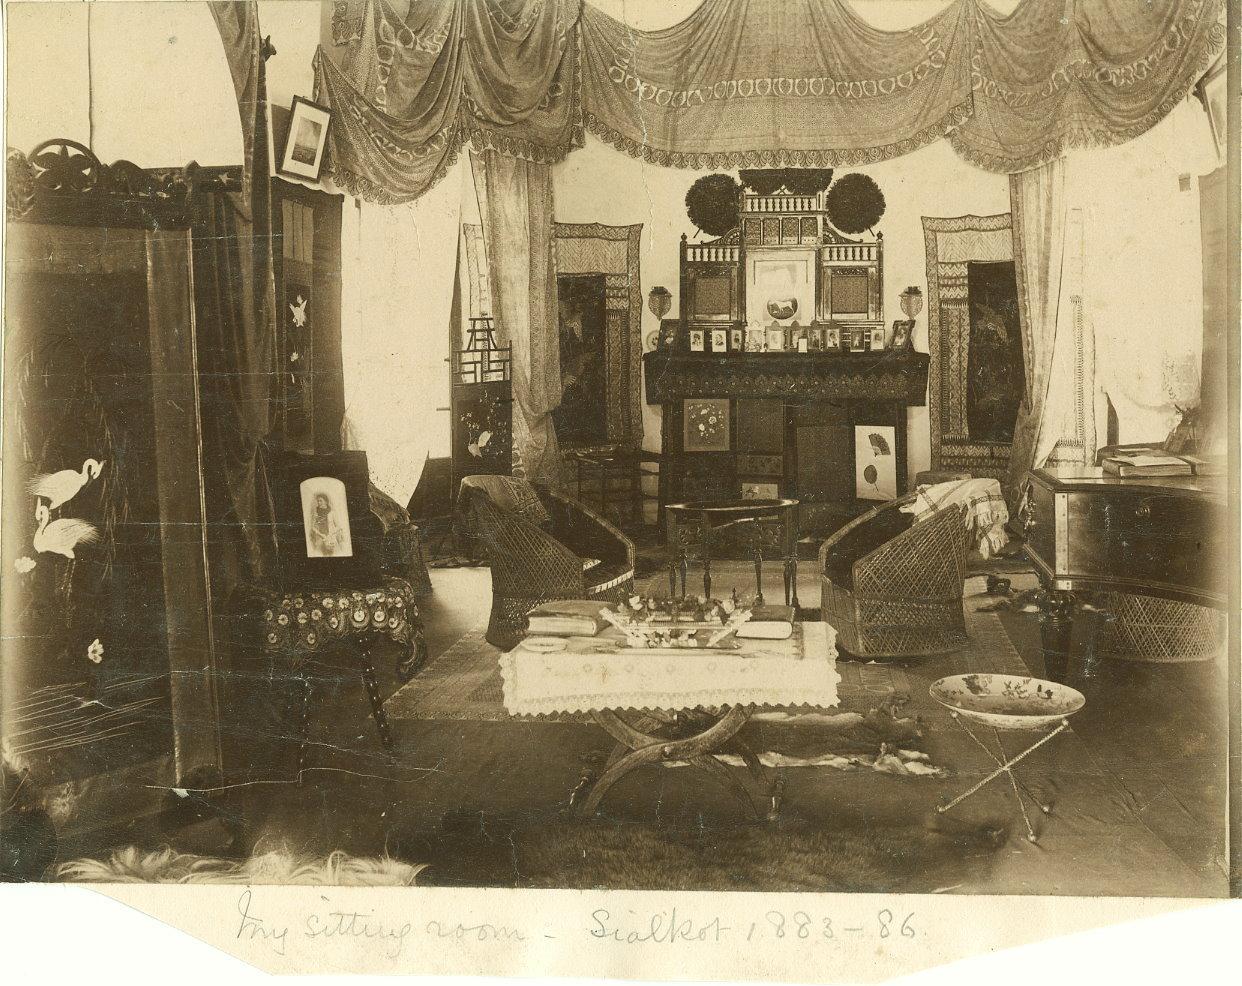 http://www.columbia.edu/itc/mealac/pritchett/00routesdata/1800_1899/britishrule/incountry/sialkot1883.jpg